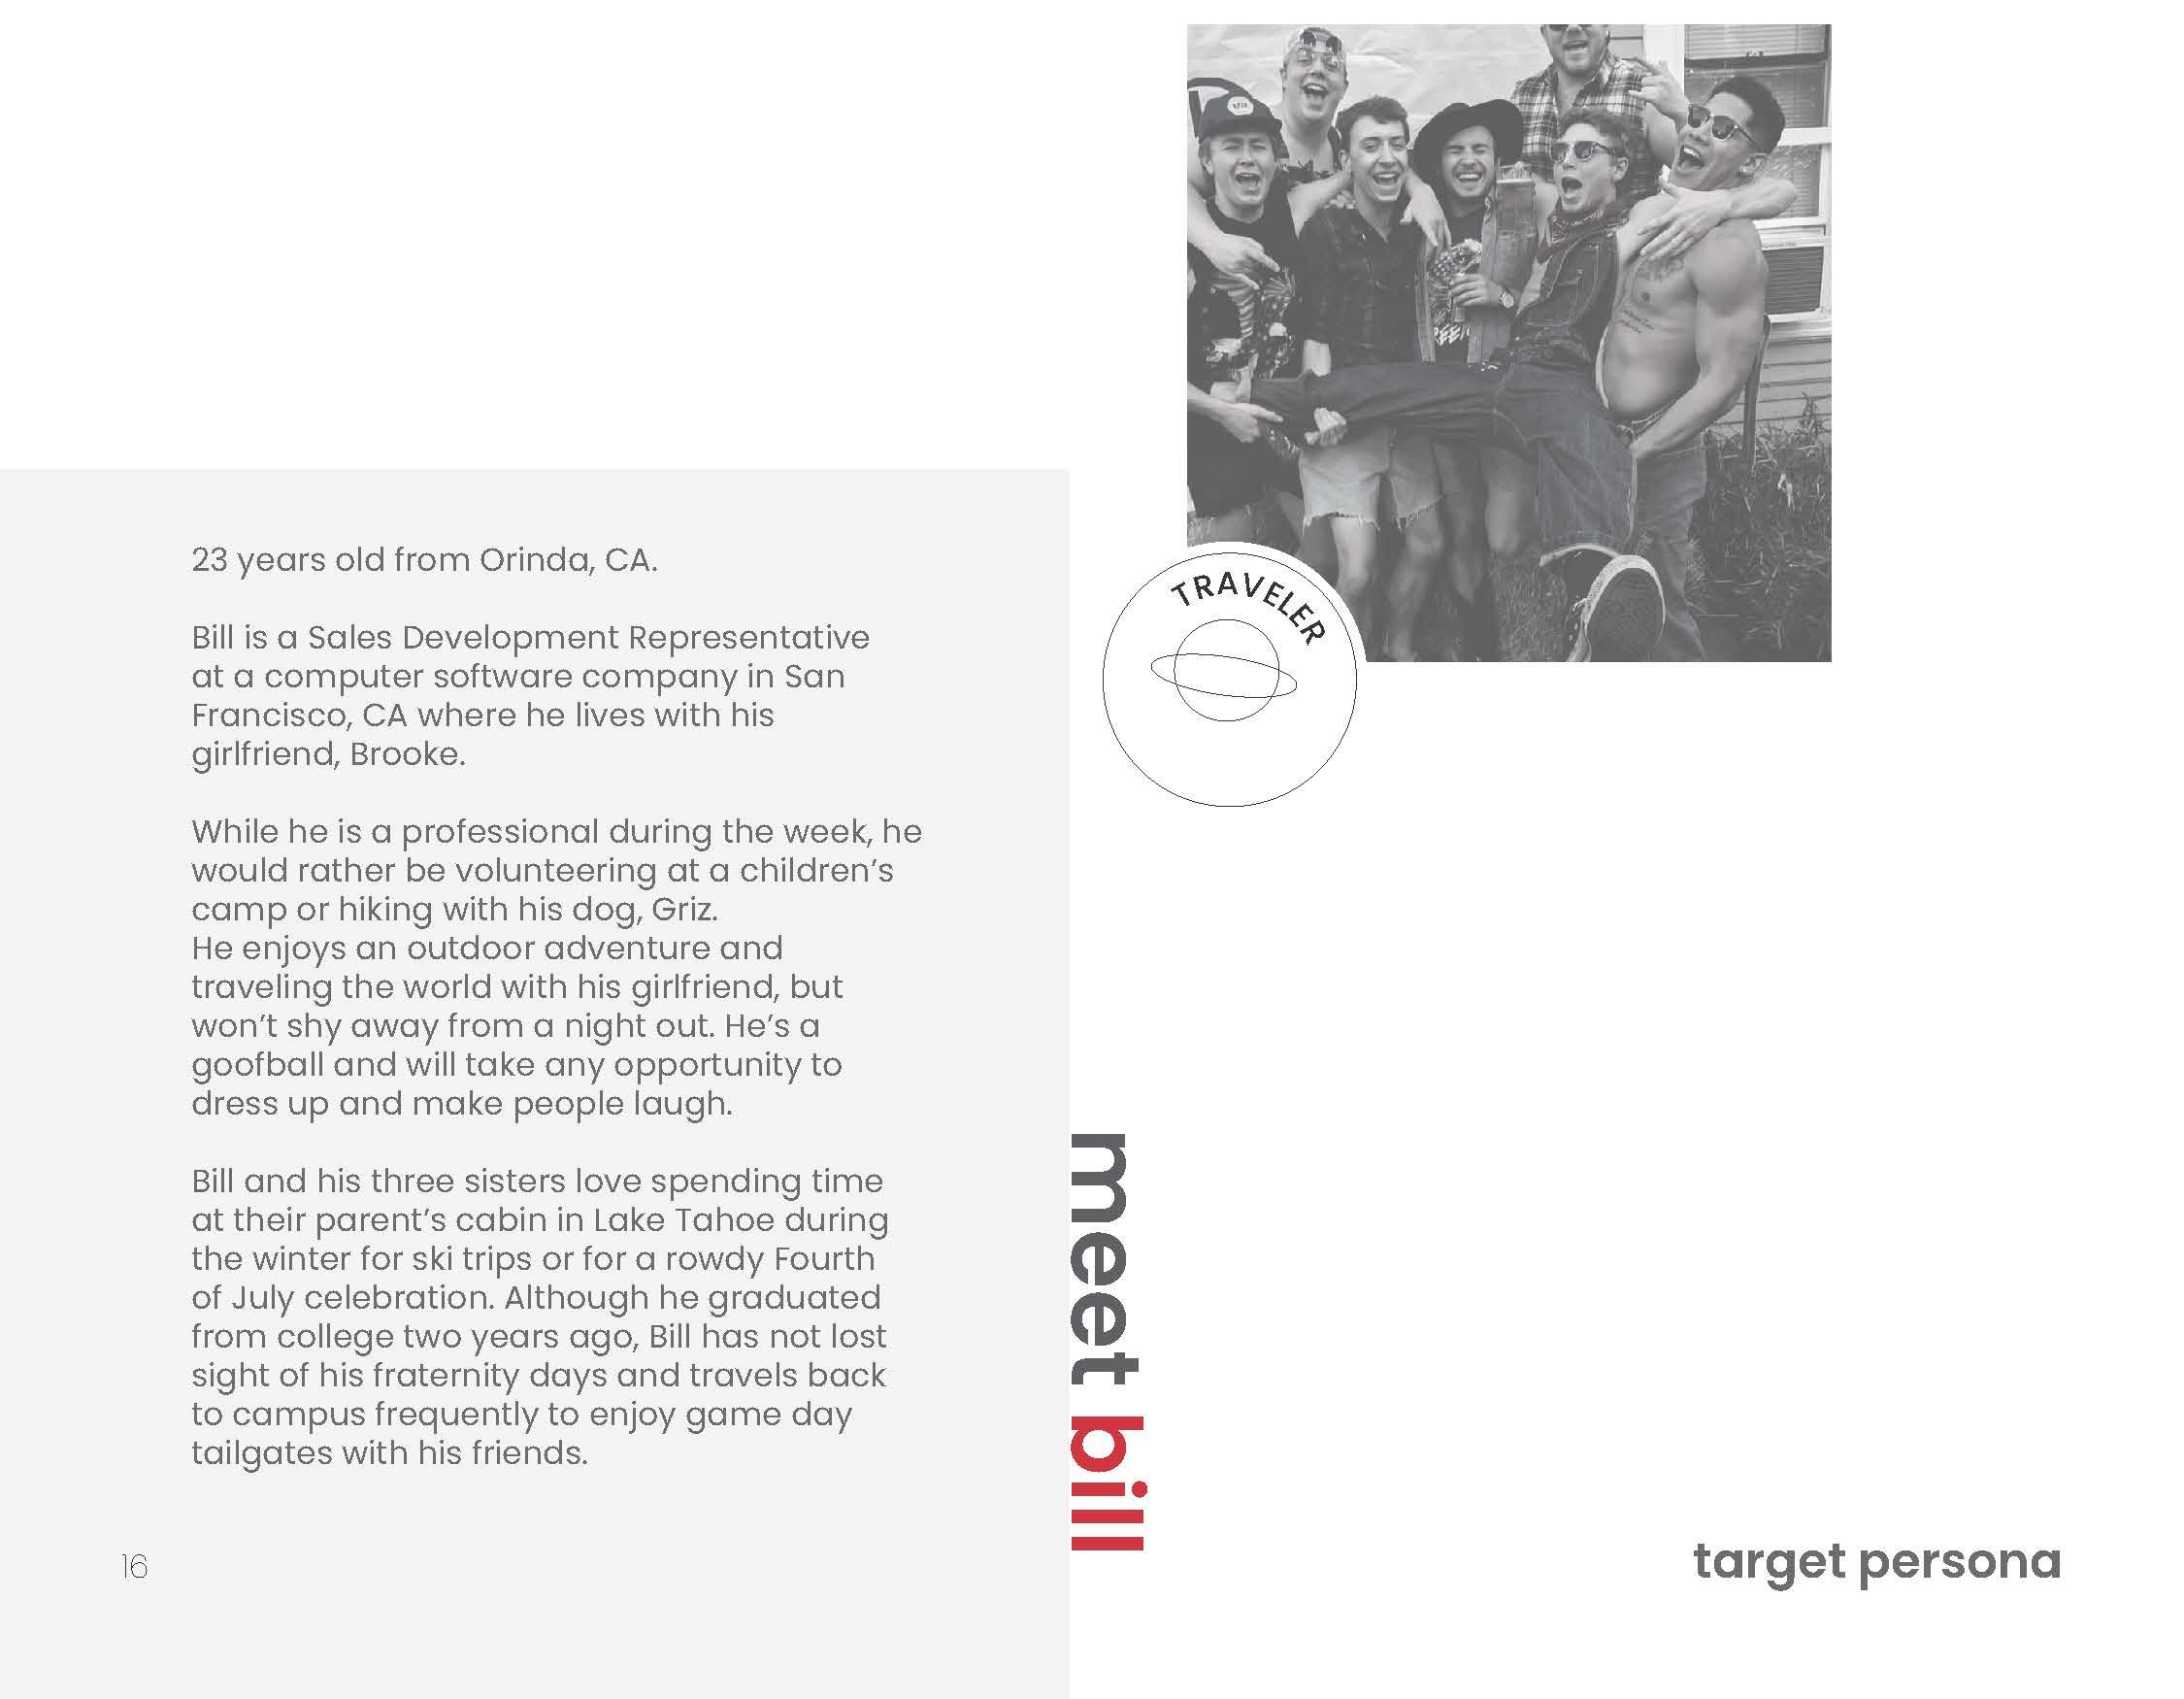 Nellah_FinalPitchBook_Portfolio_lululemon_Page_16.jpg